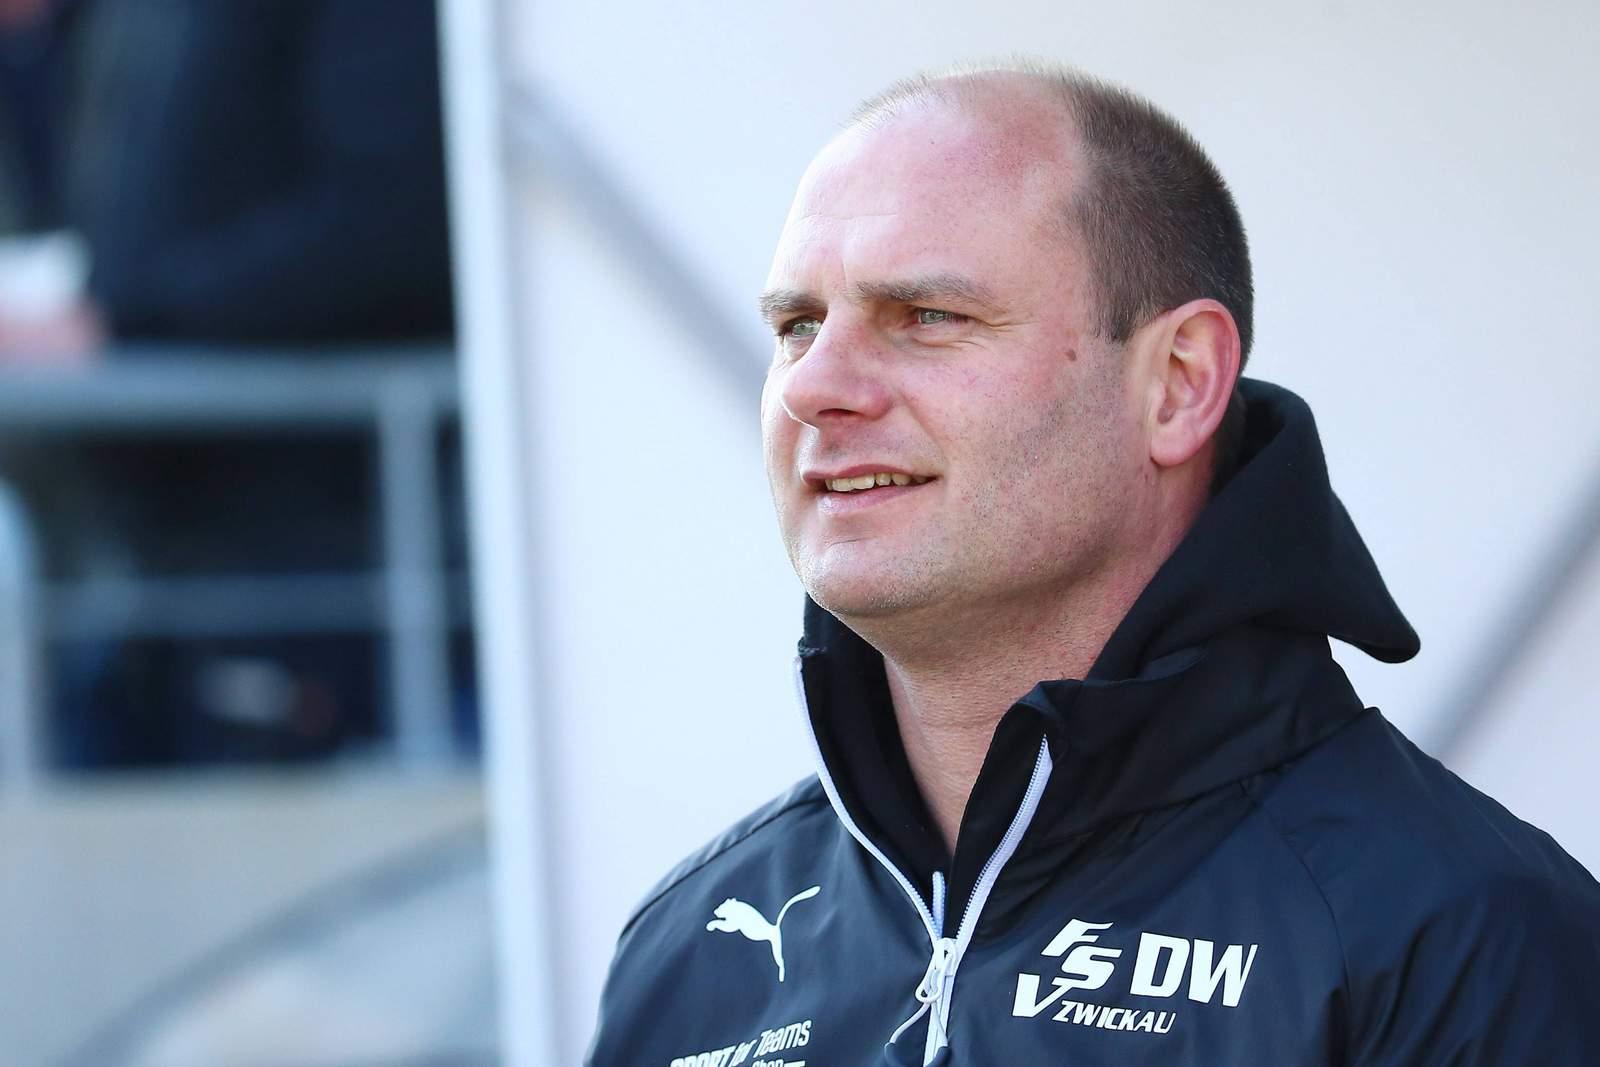 Neue Transferpläne für Winterpause: Zwickaus Sportdirektor David Wagner